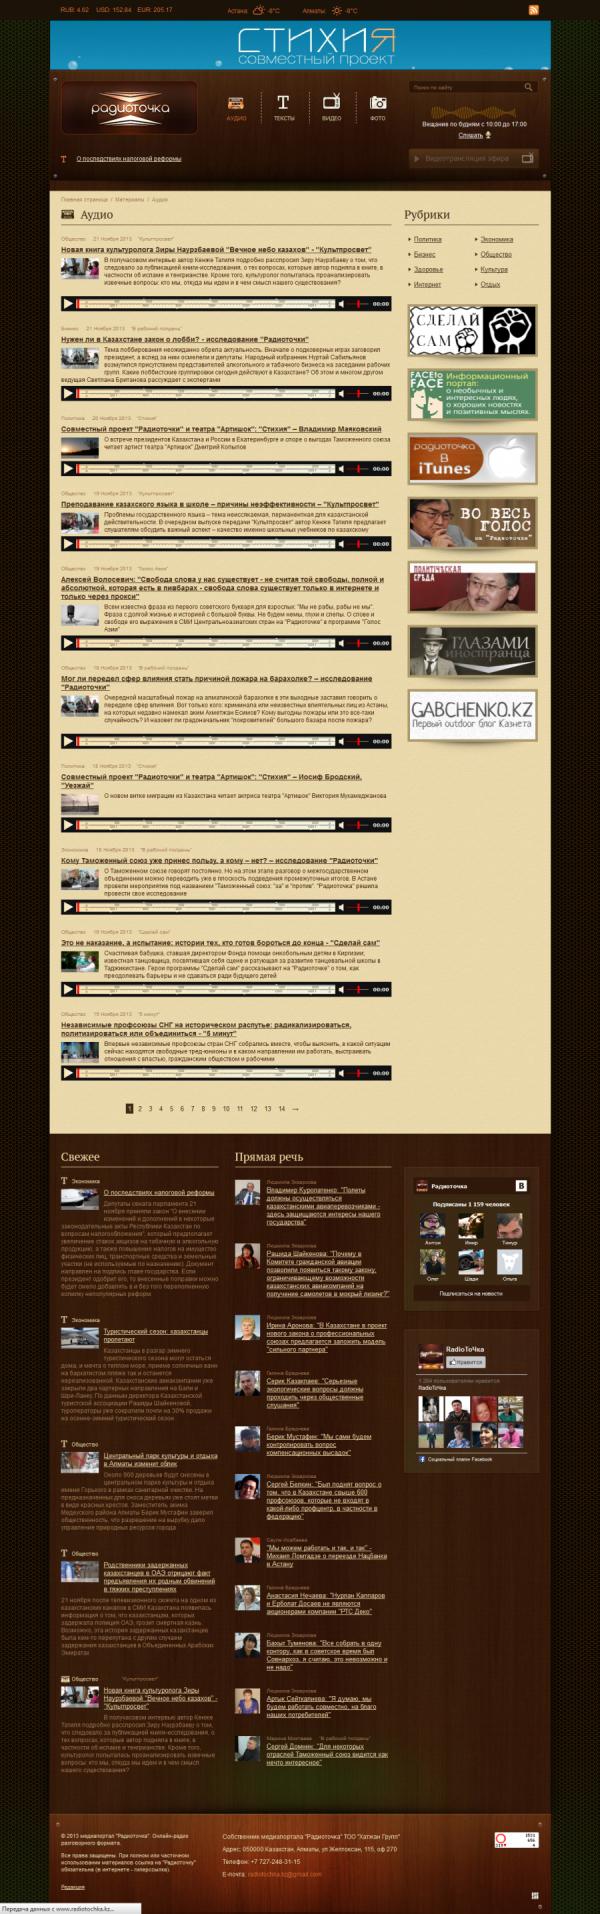 Медиапортал «Радиоточка» и онлайн-радио разговорного формата.